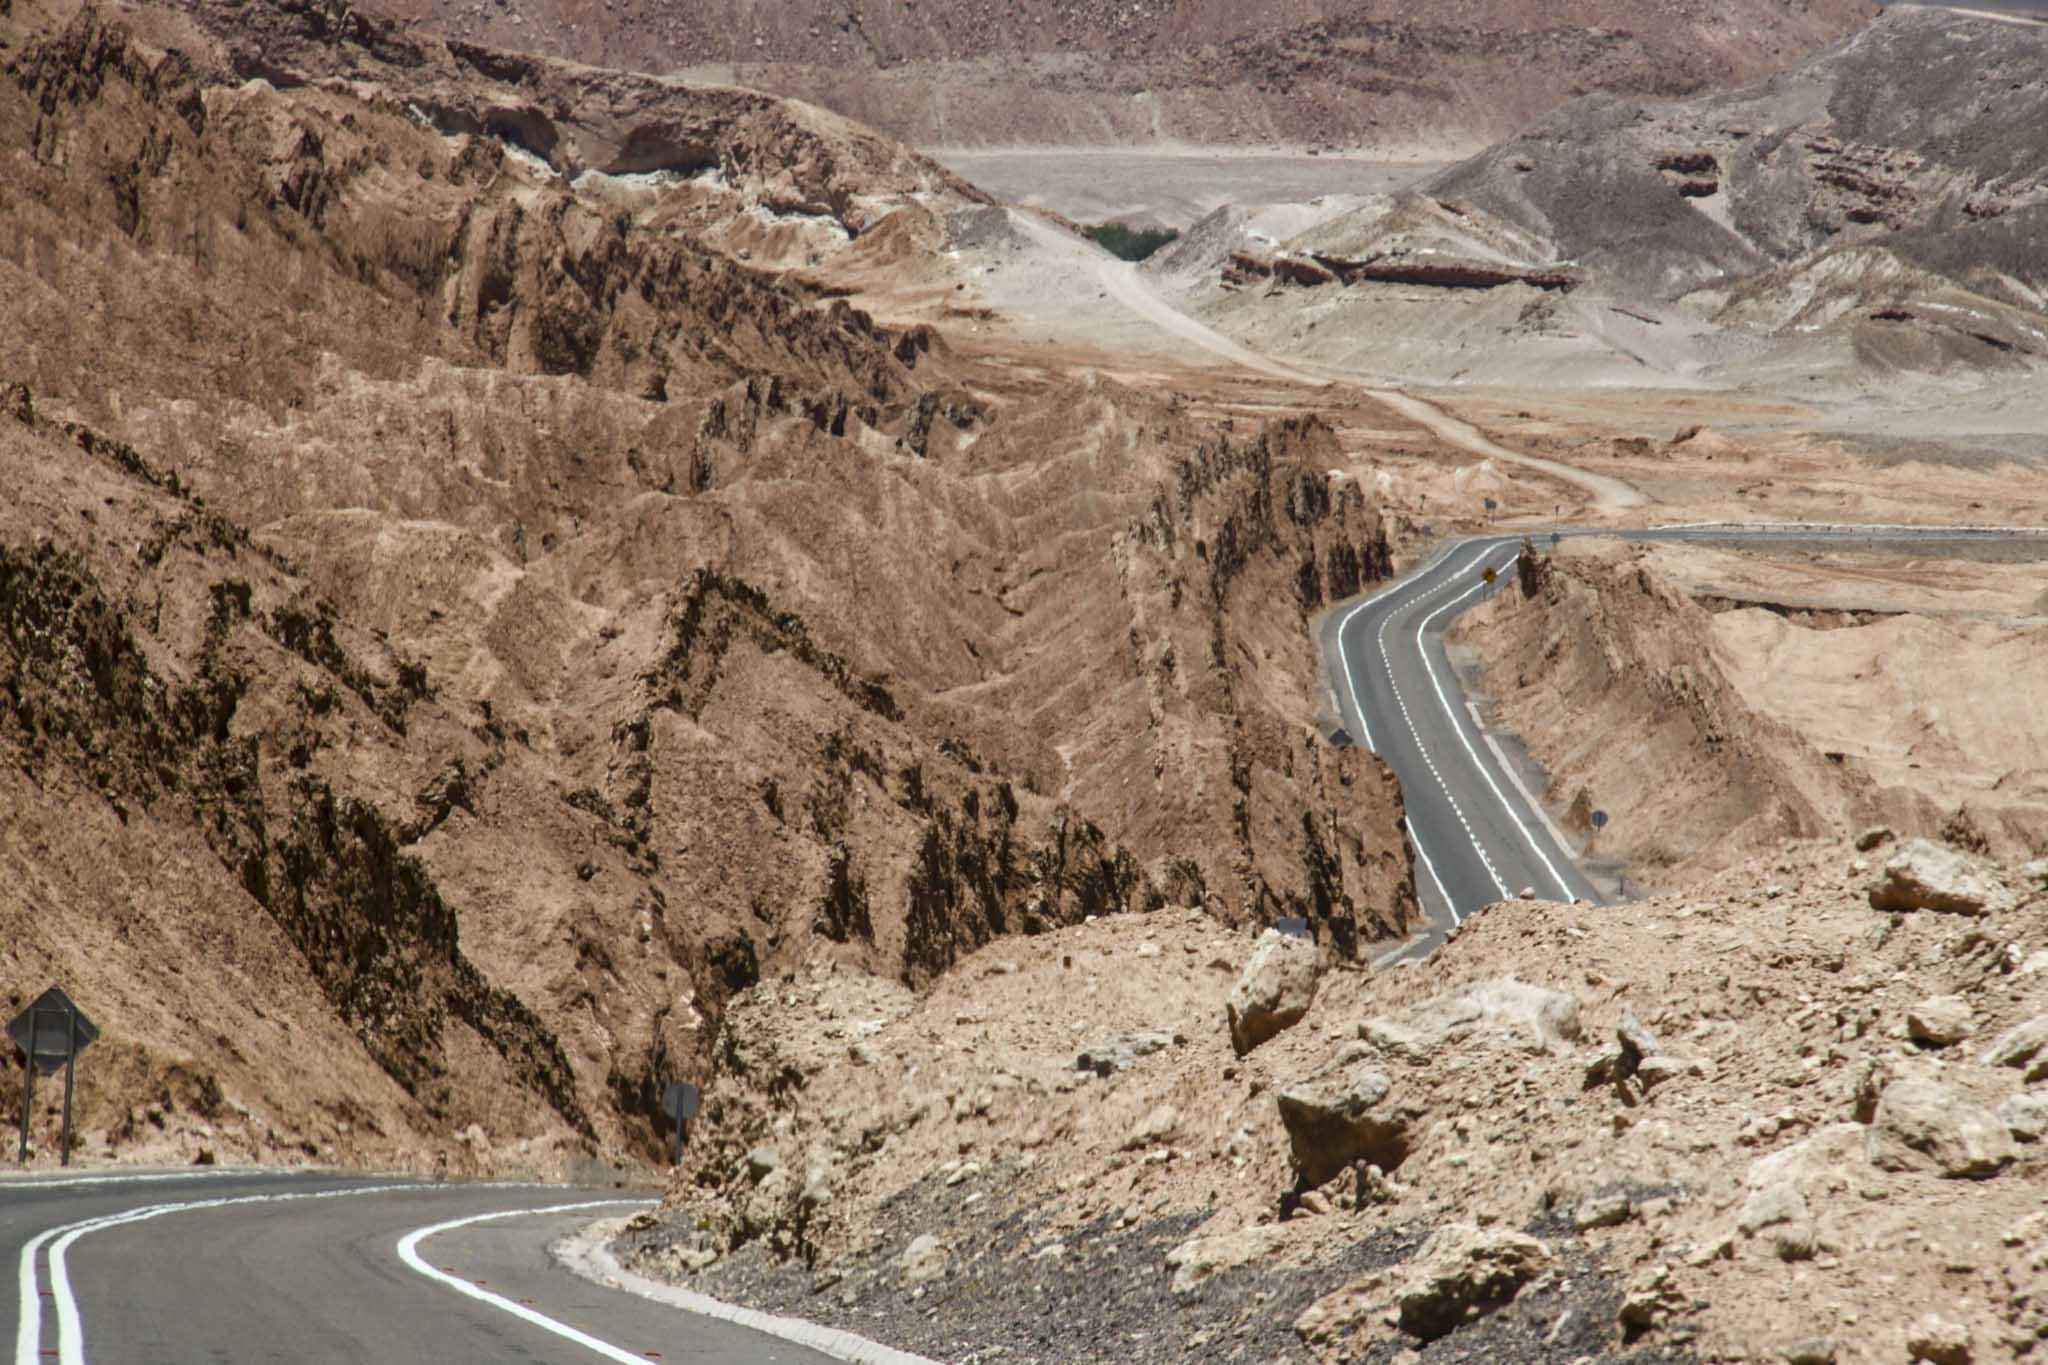 Deserto roads